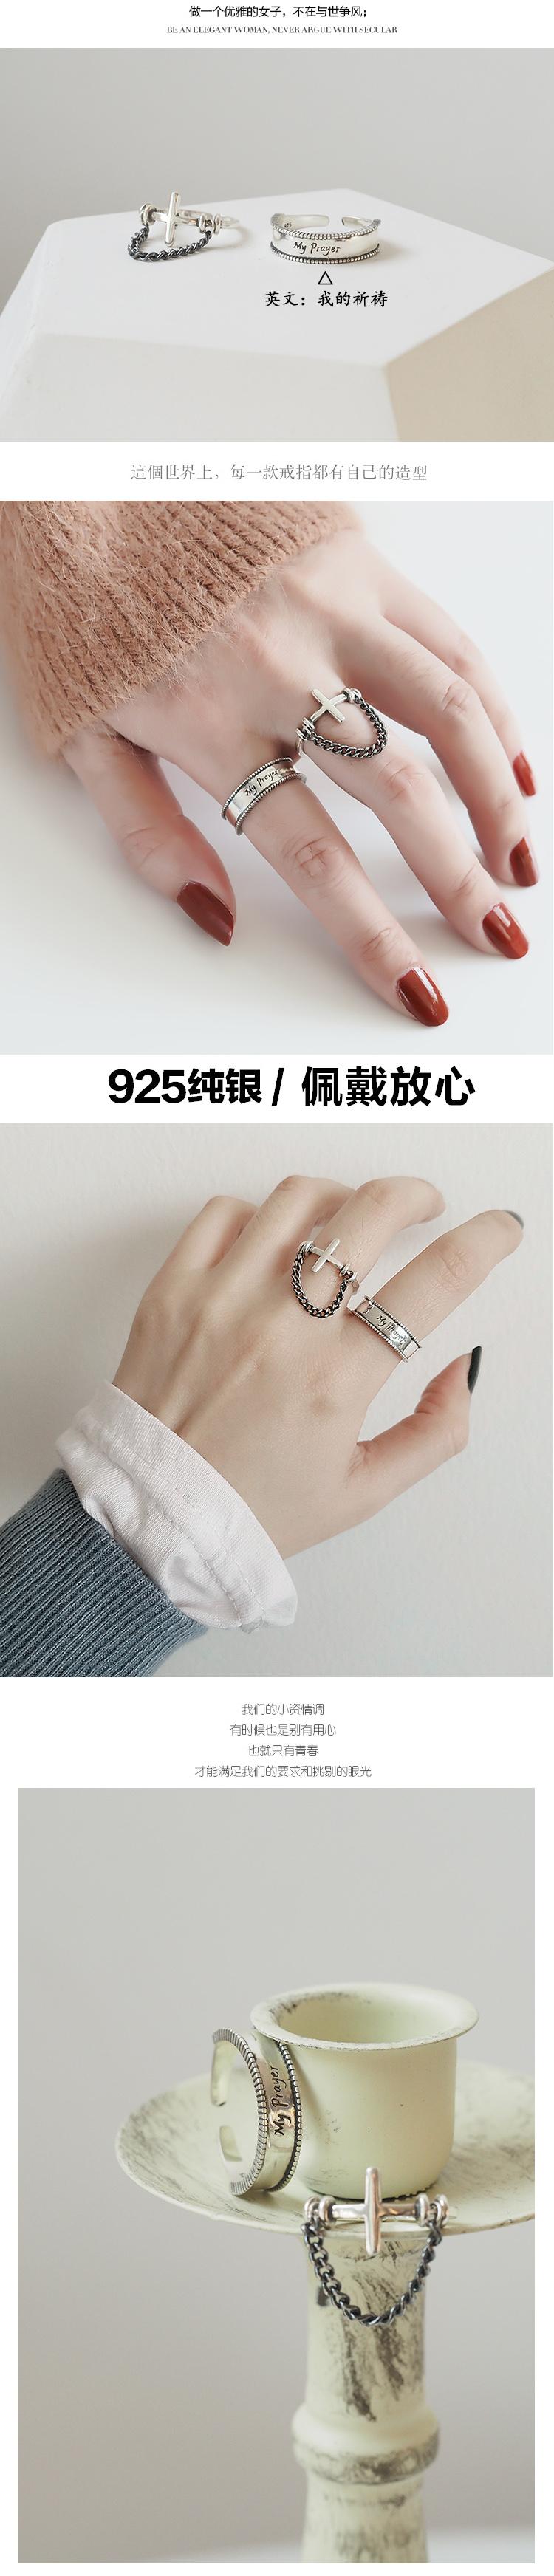 s925纯银食指戒指女士潮人日韩简约链条十字架指环戒子韩国饰品